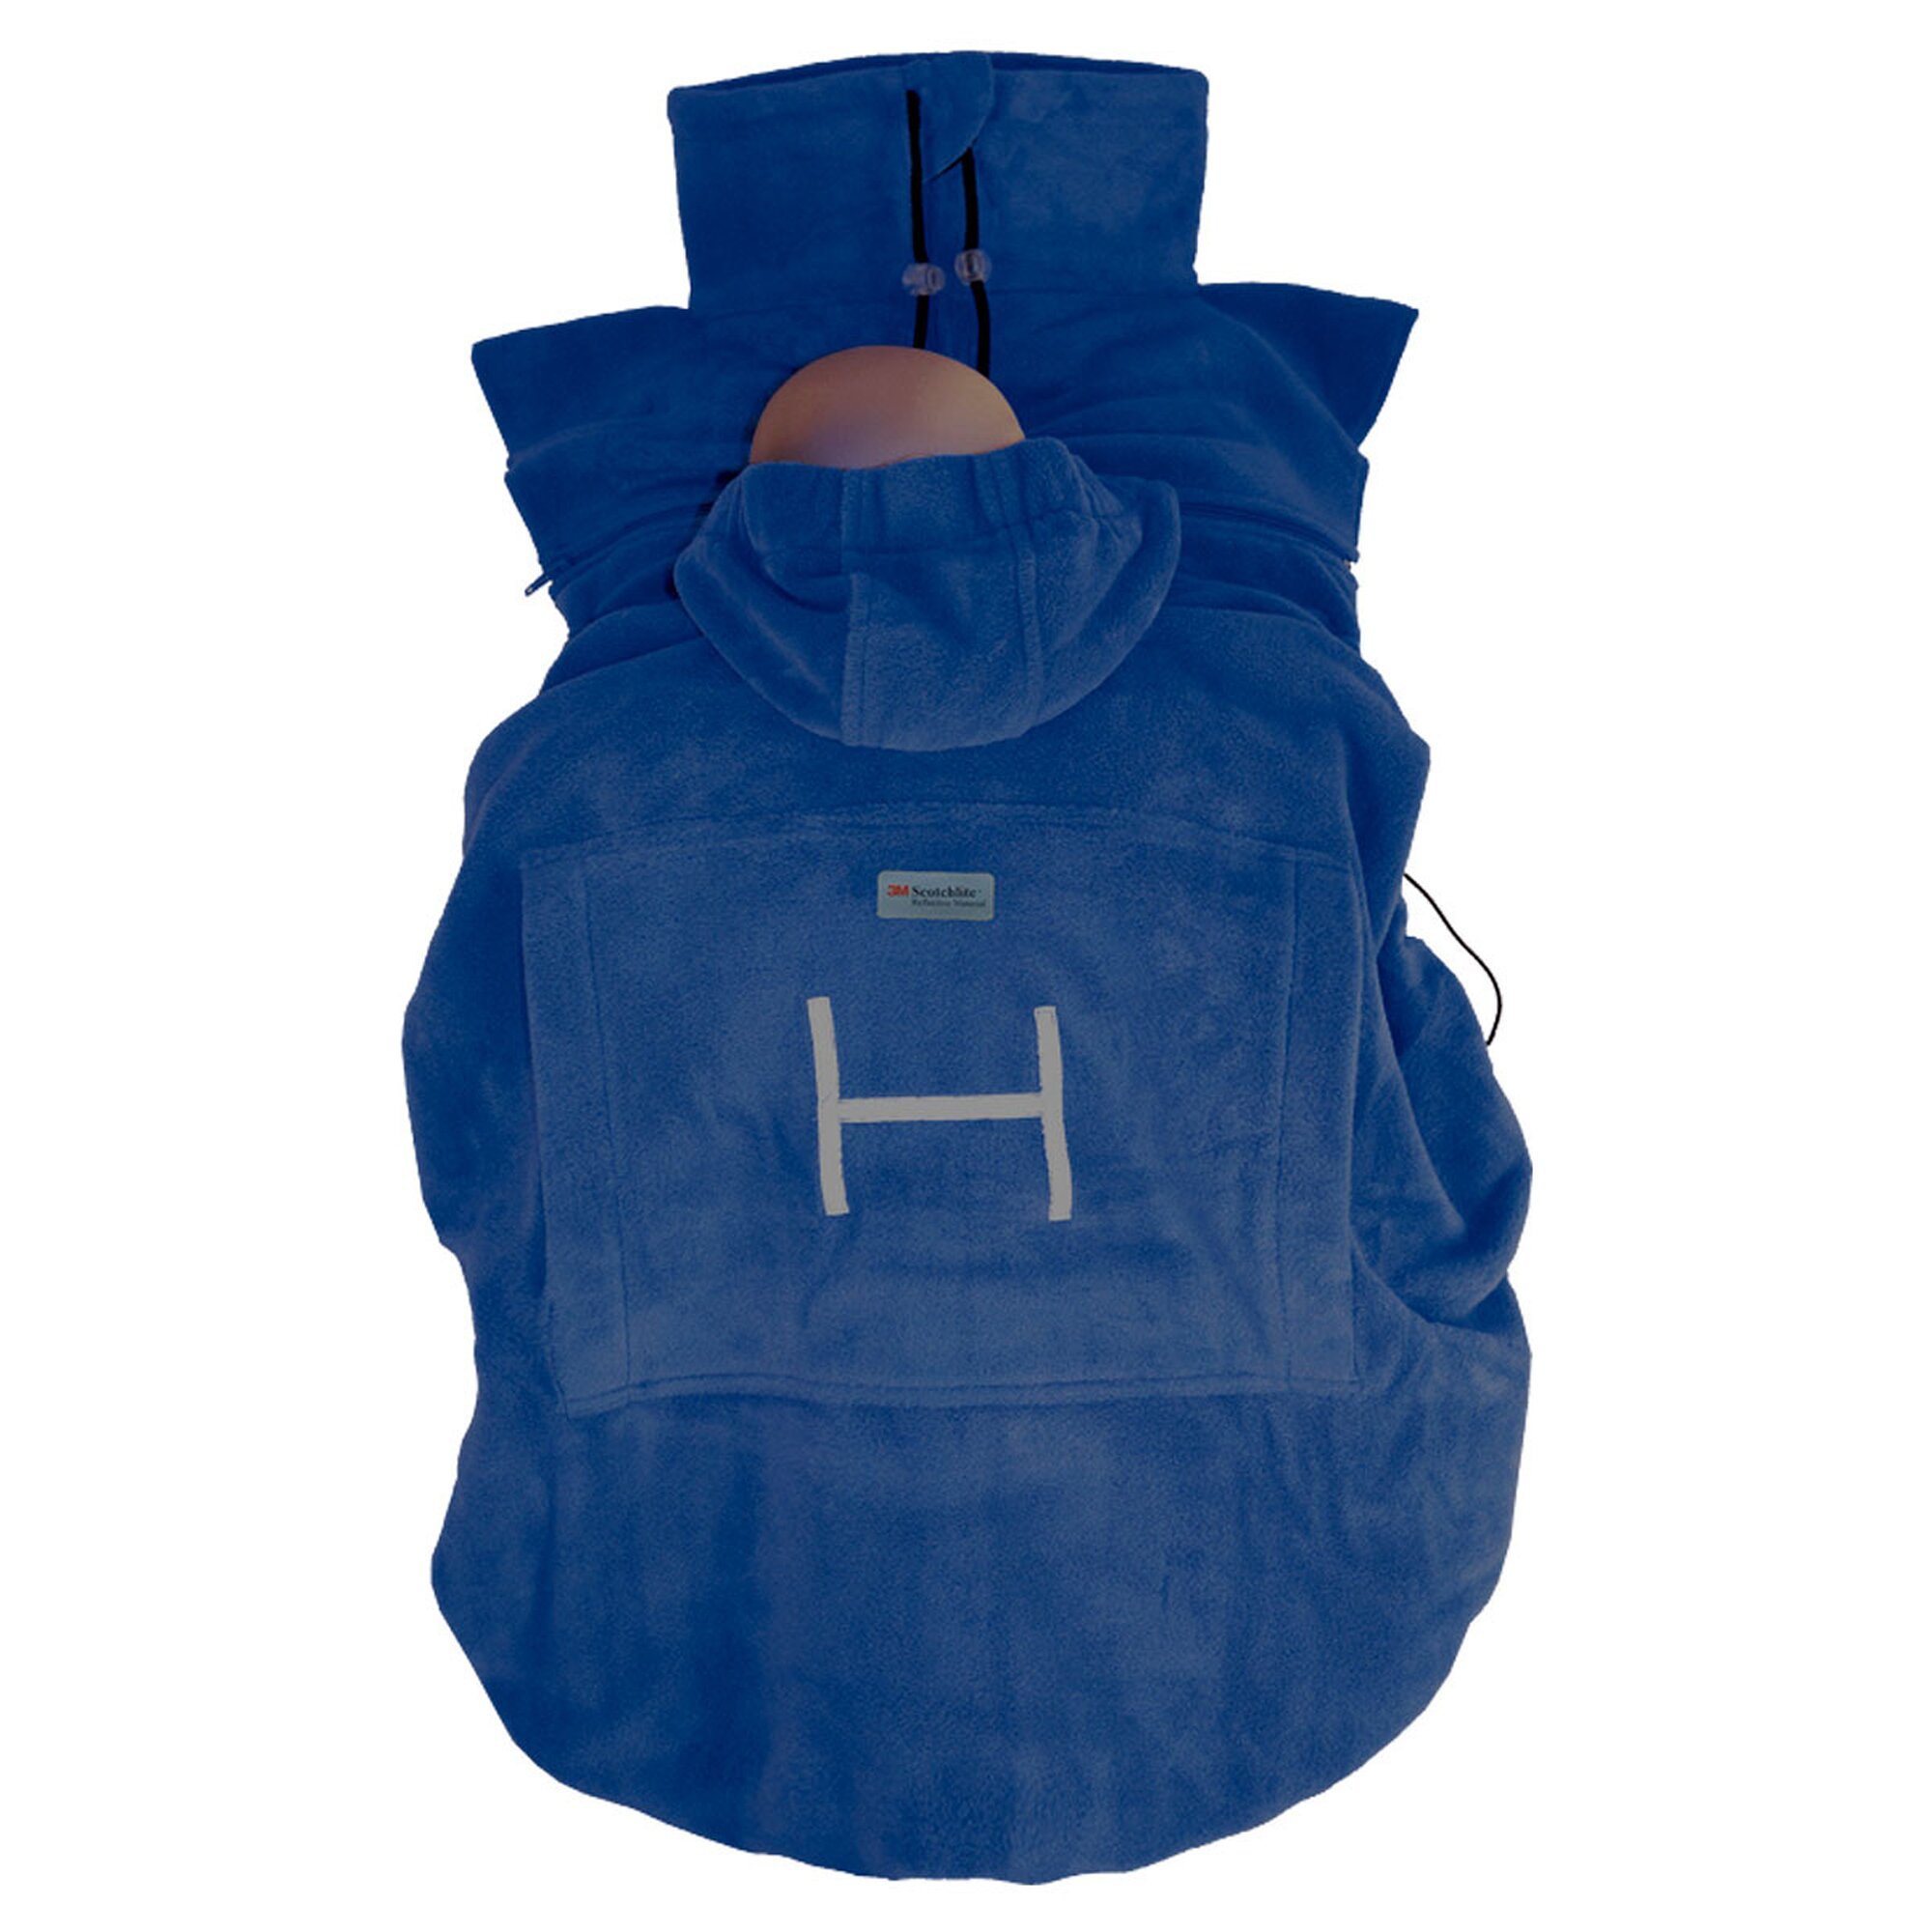 easymaxx-fleece-cover-basic-blau